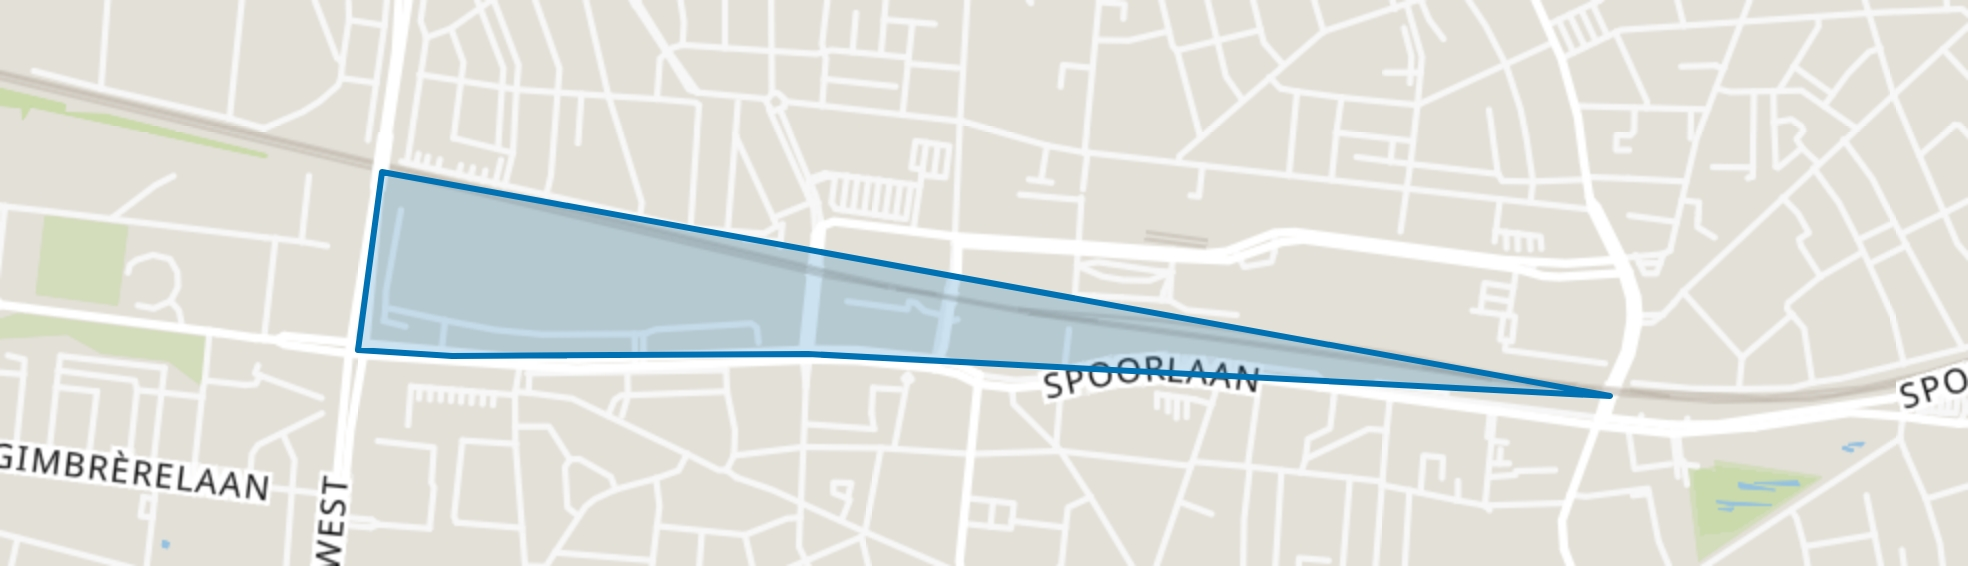 Spoorzone Zuid, Tilburg map